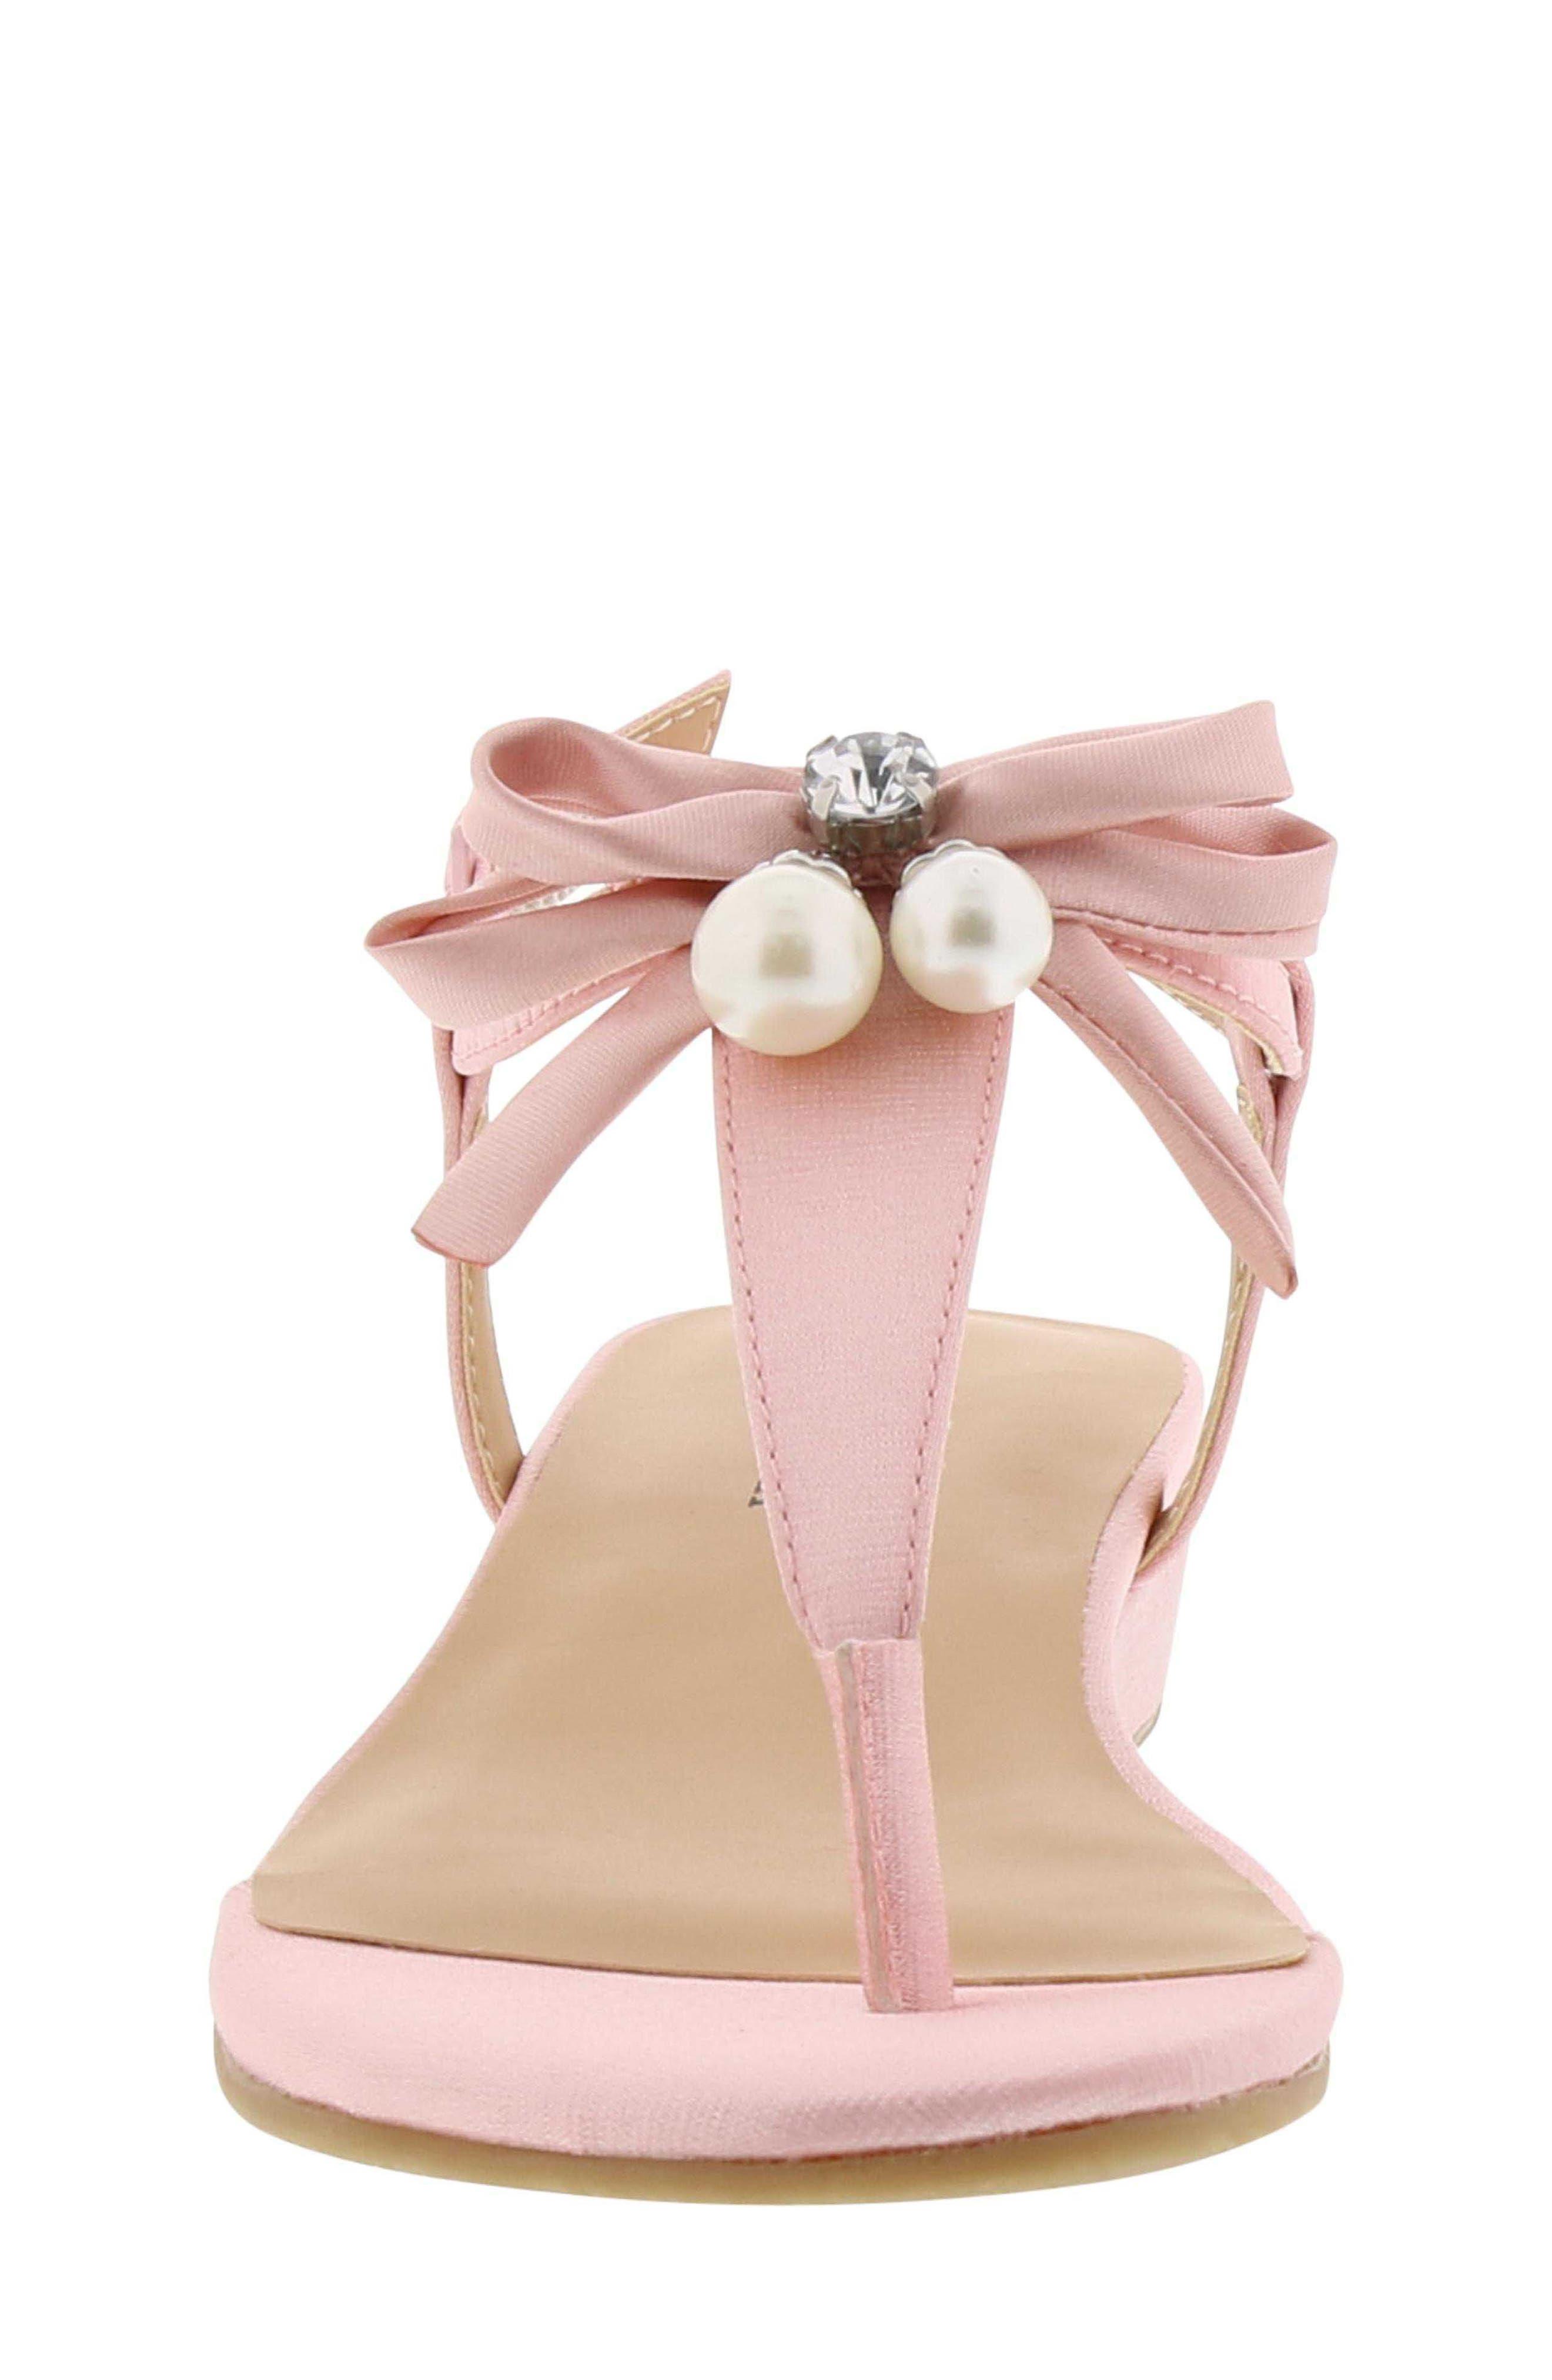 Talia Embellished Bow Sandal,                             Alternate thumbnail 4, color,                             Light Pink